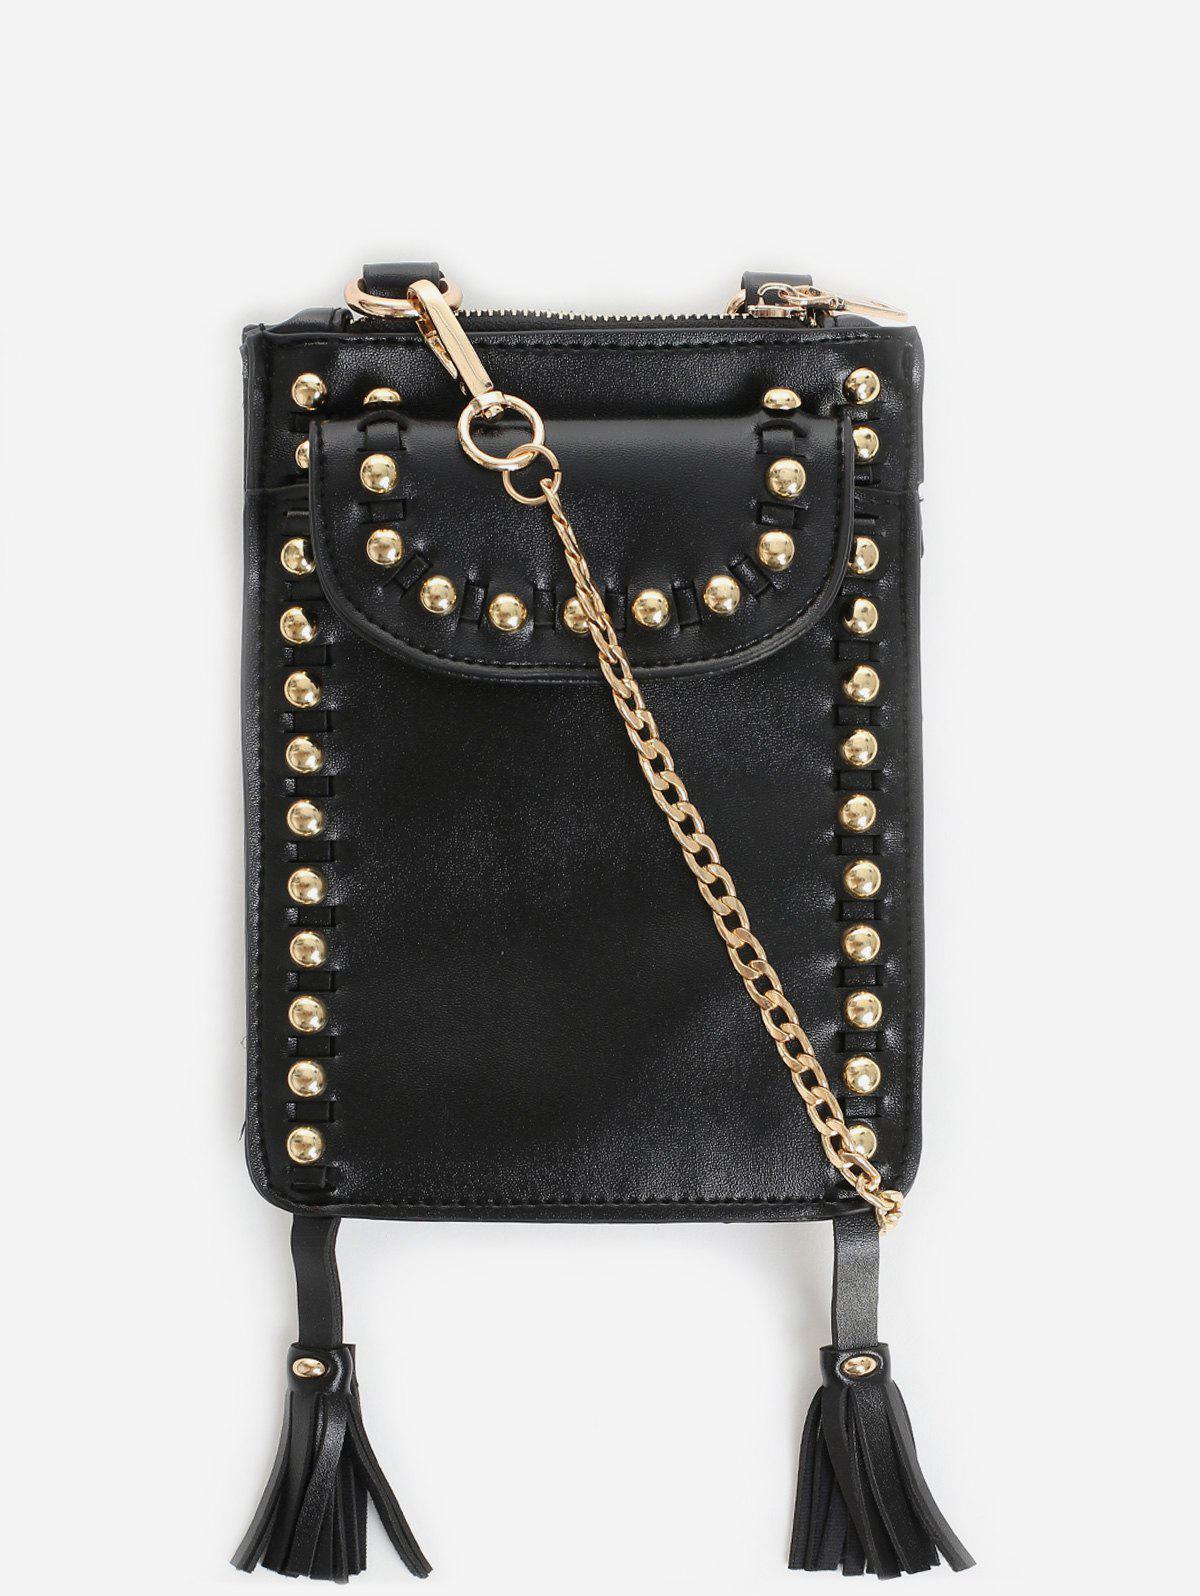 Zaful   BLACK Rivet Tassel PU Leather Crossbody Bag   Clouty